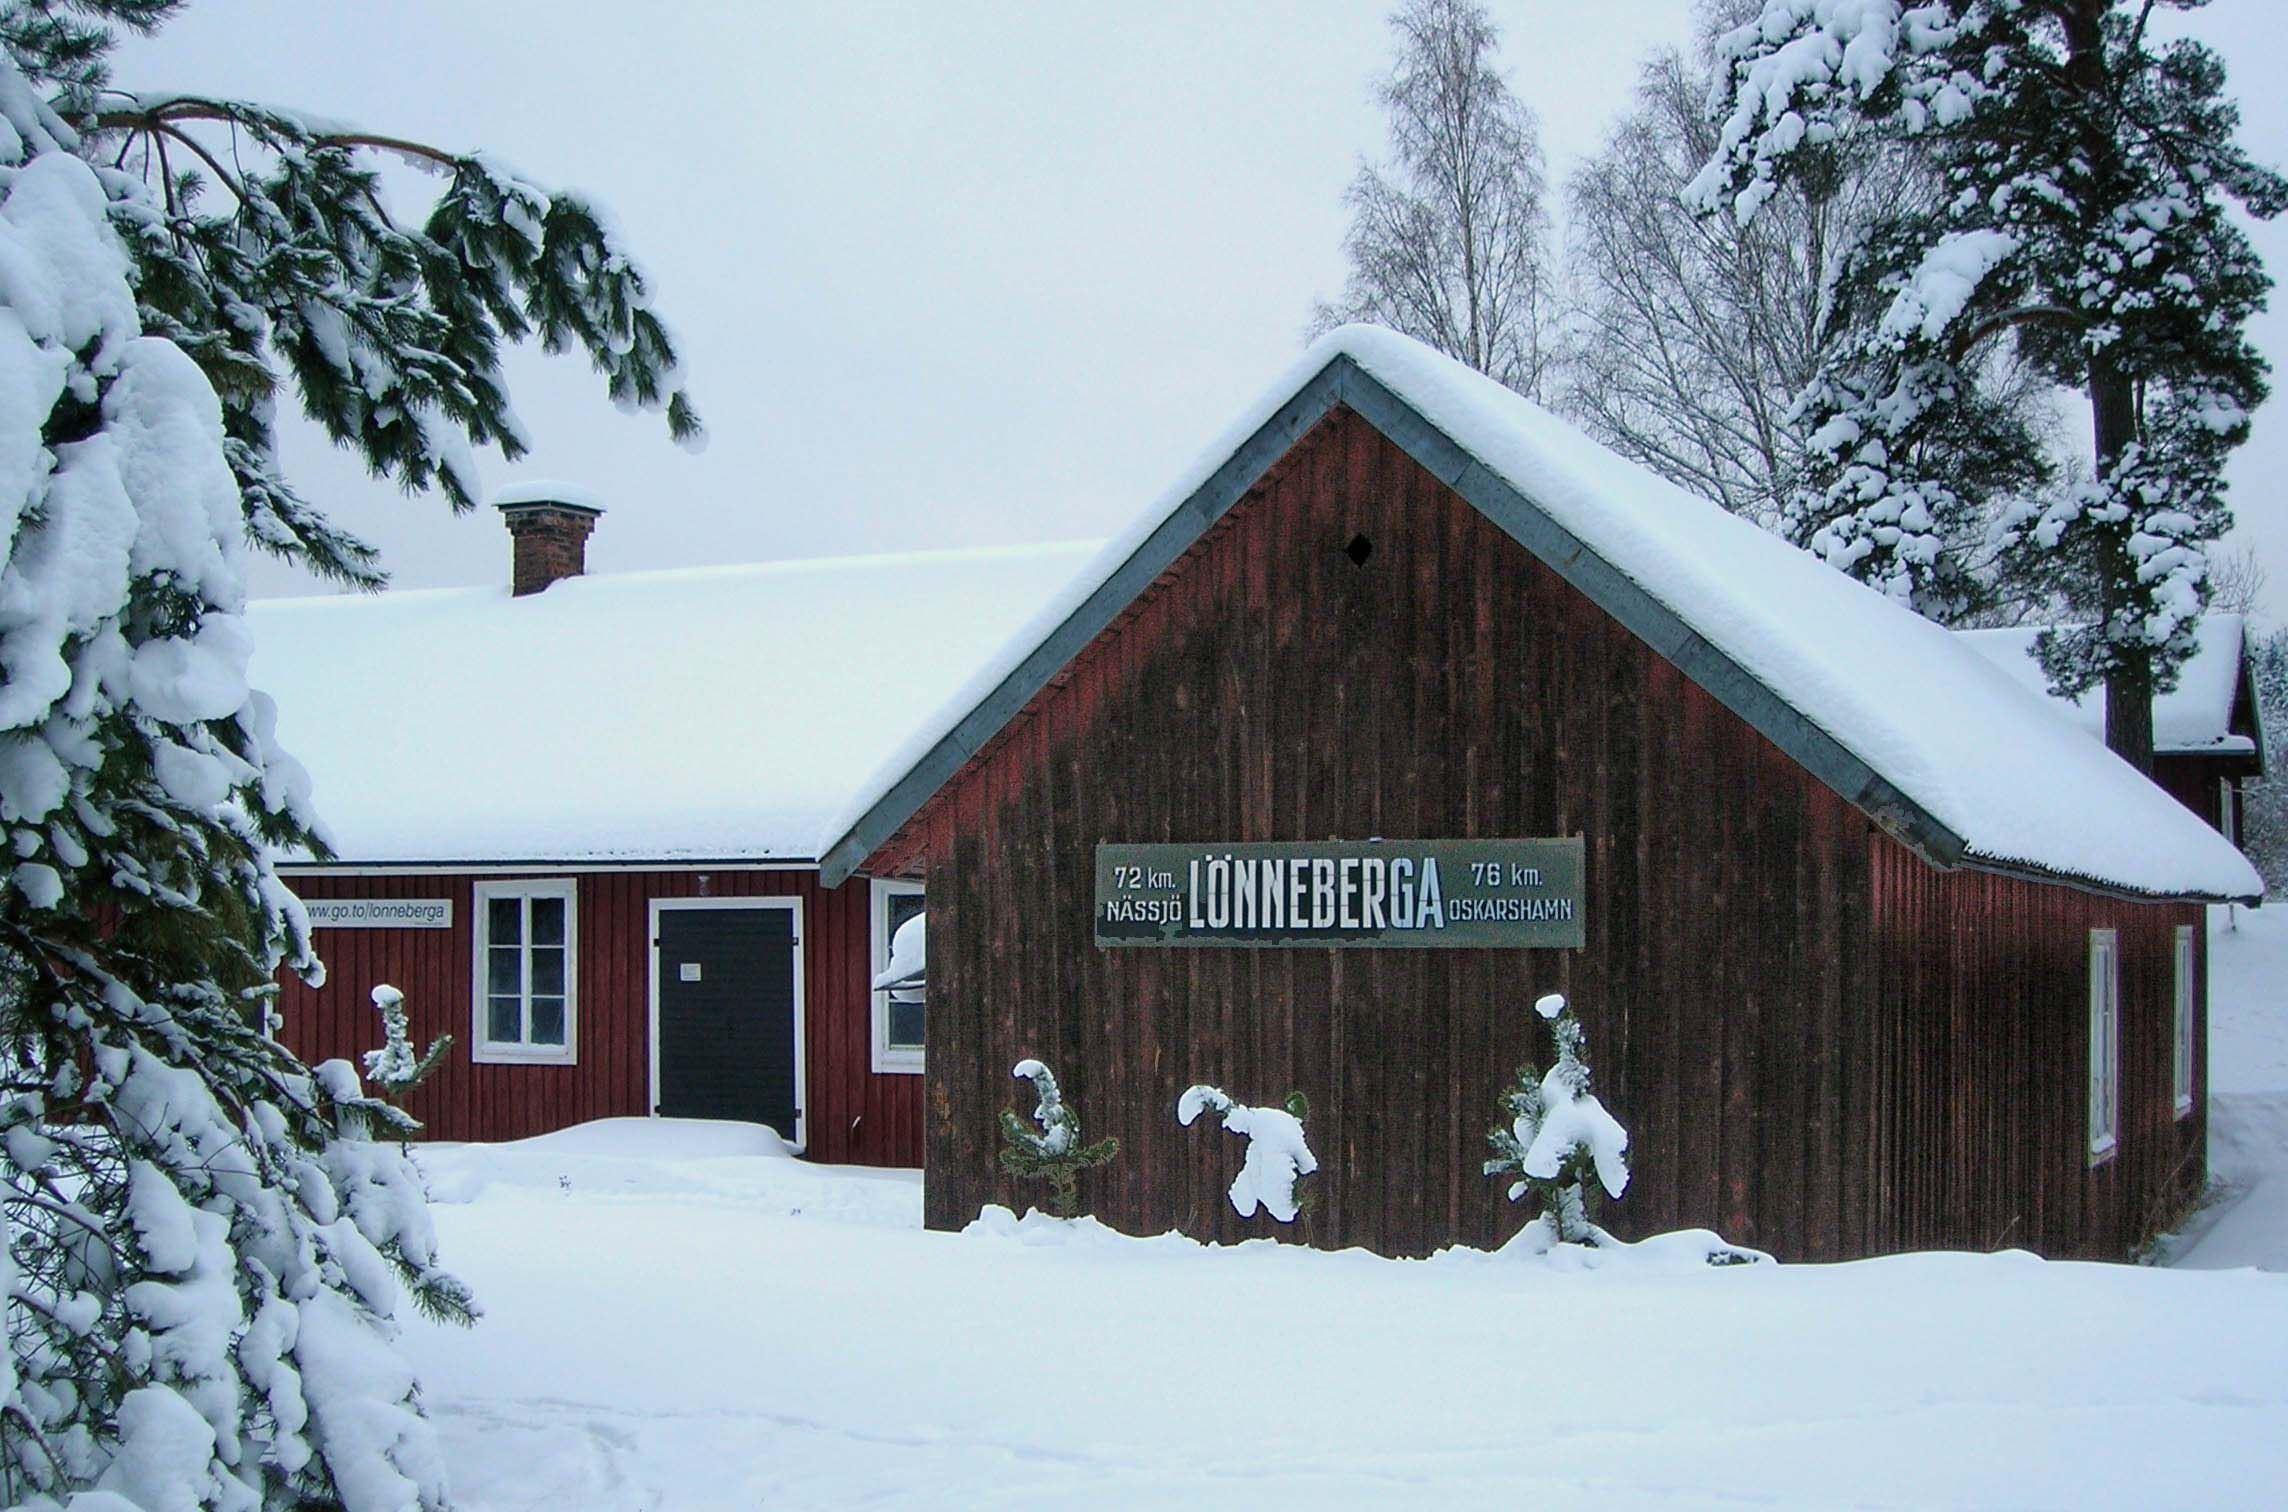 Ålunds mekaniska verkstad, Lönneberga